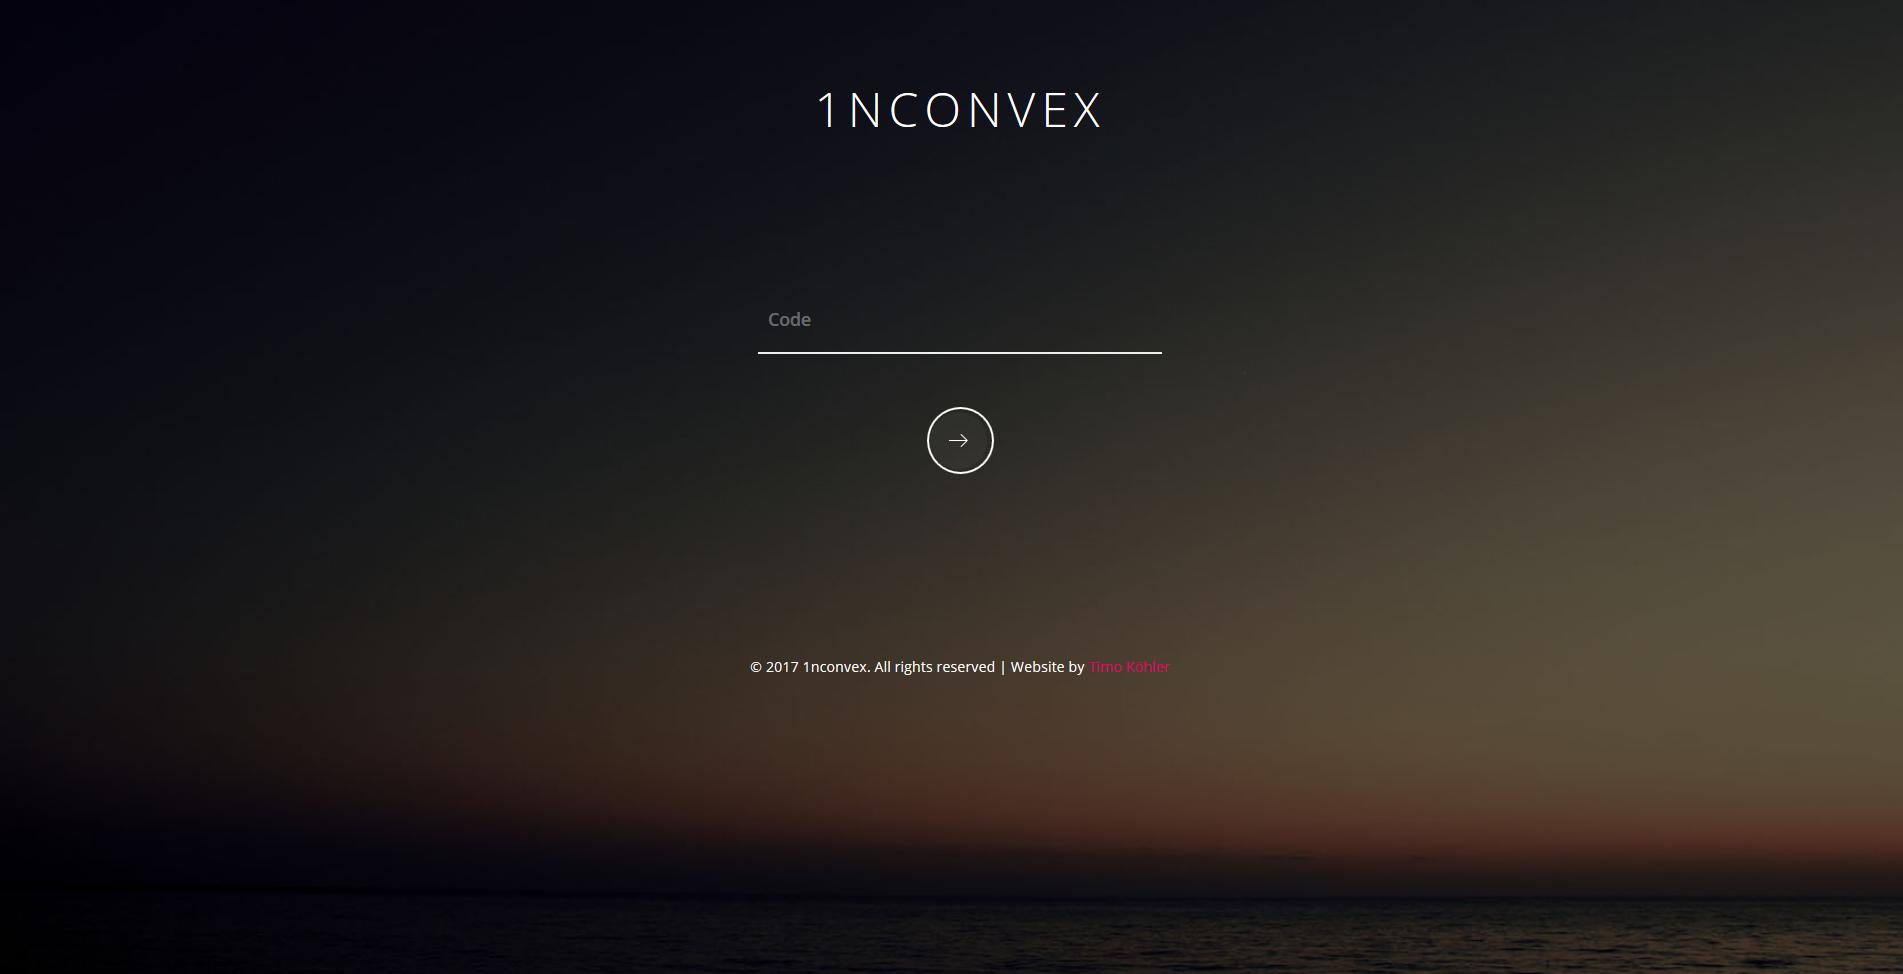 https://files.web-timo.de/ws/1nconvex.tsite.de.png